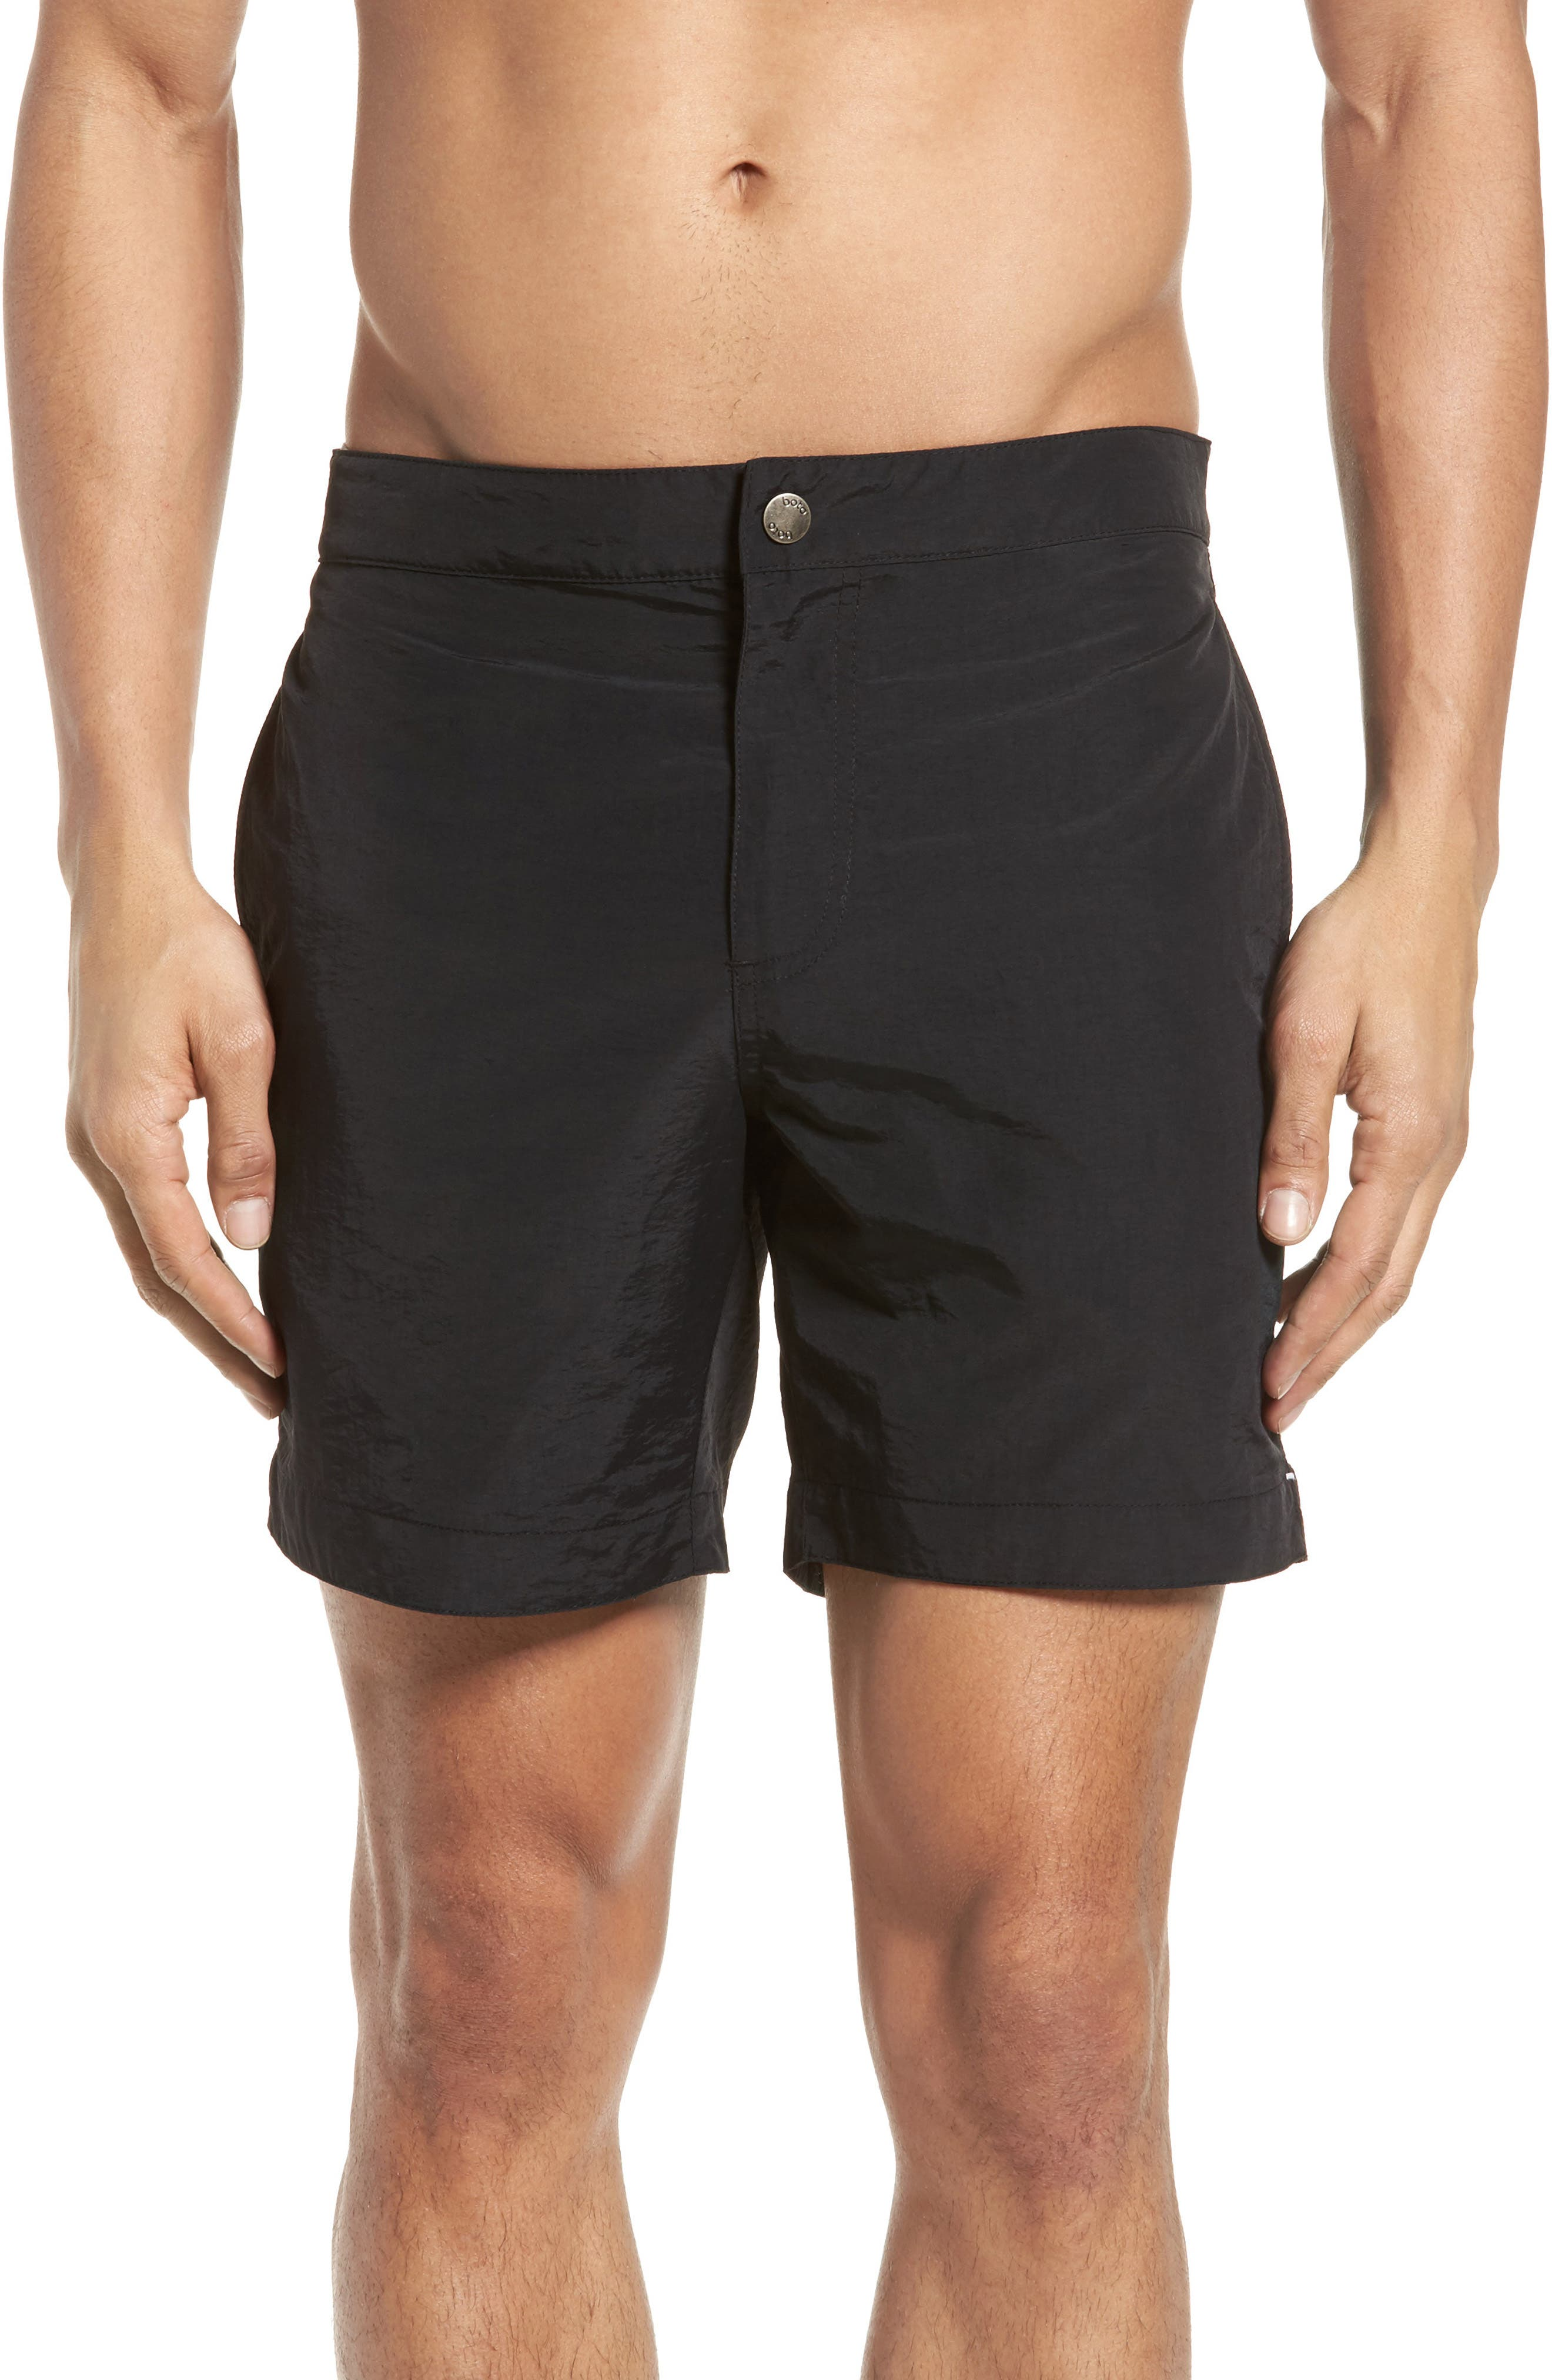 'Aruba' Tailored Fit Swim Trunks,                             Main thumbnail 1, color,                             Midnight Black Solid